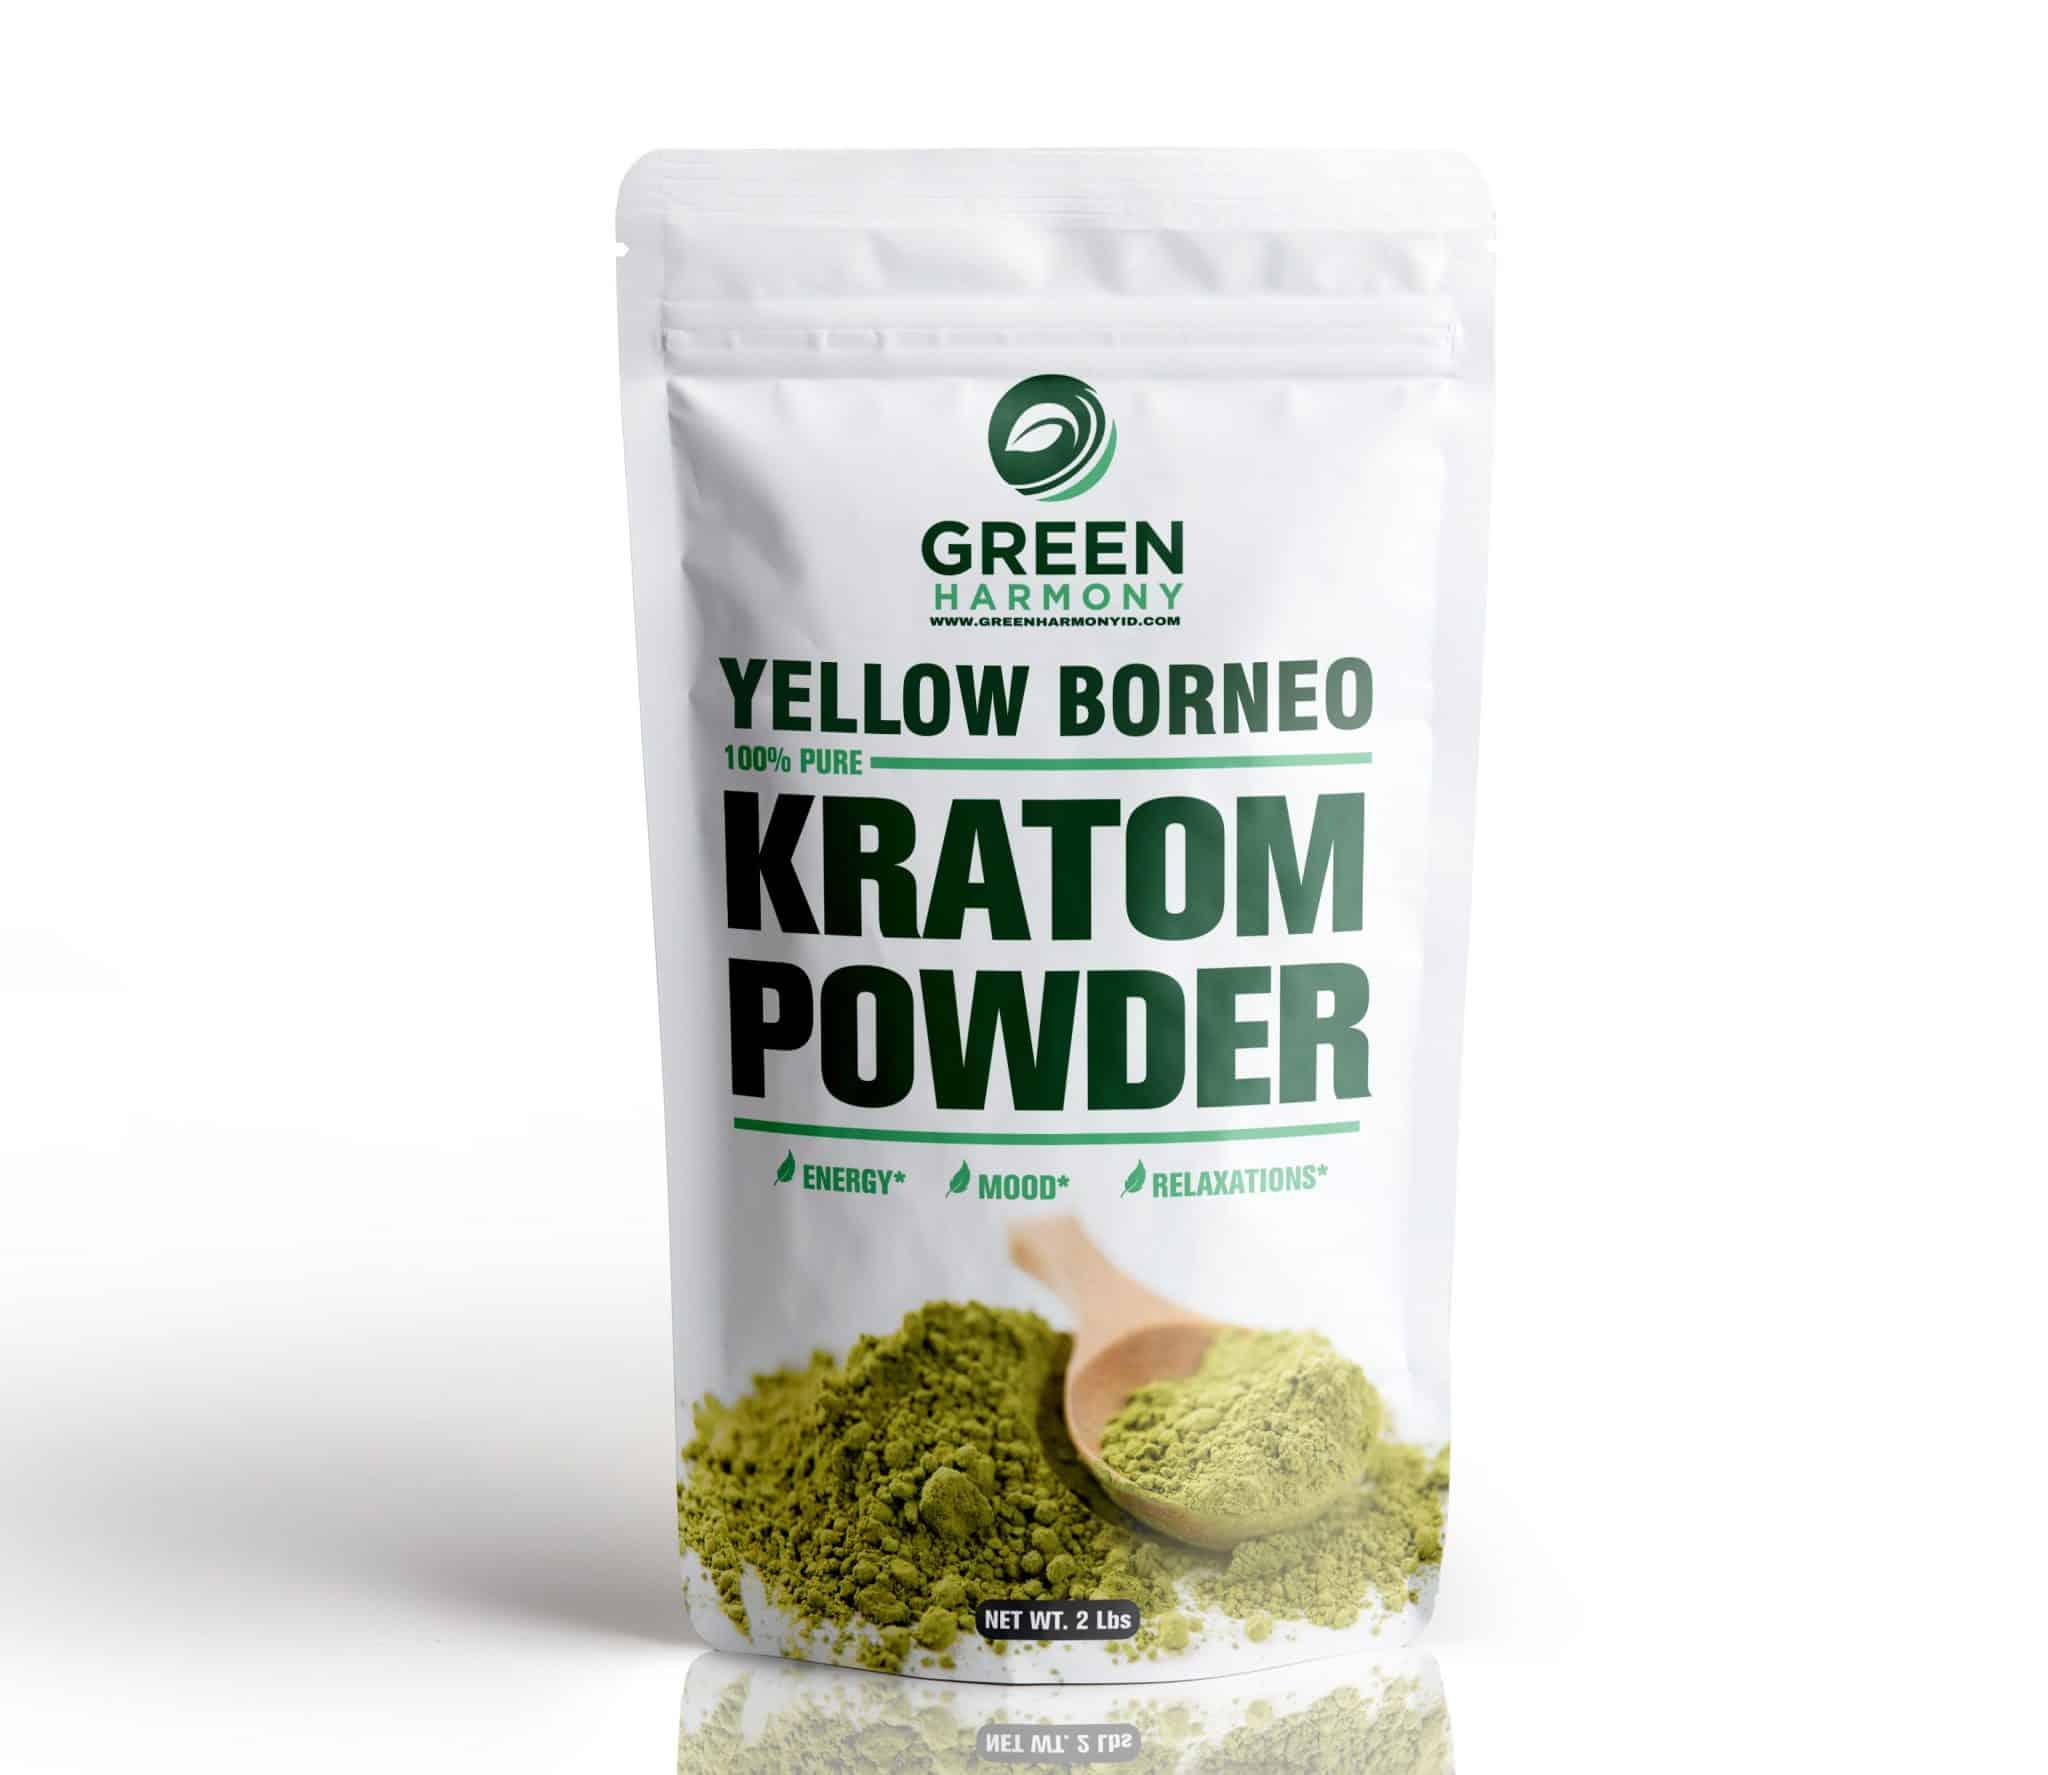 Yellow Borneo Kratom Strains - Green Harmony Indonesia Kratom Vendor - buy kratom online with confidence